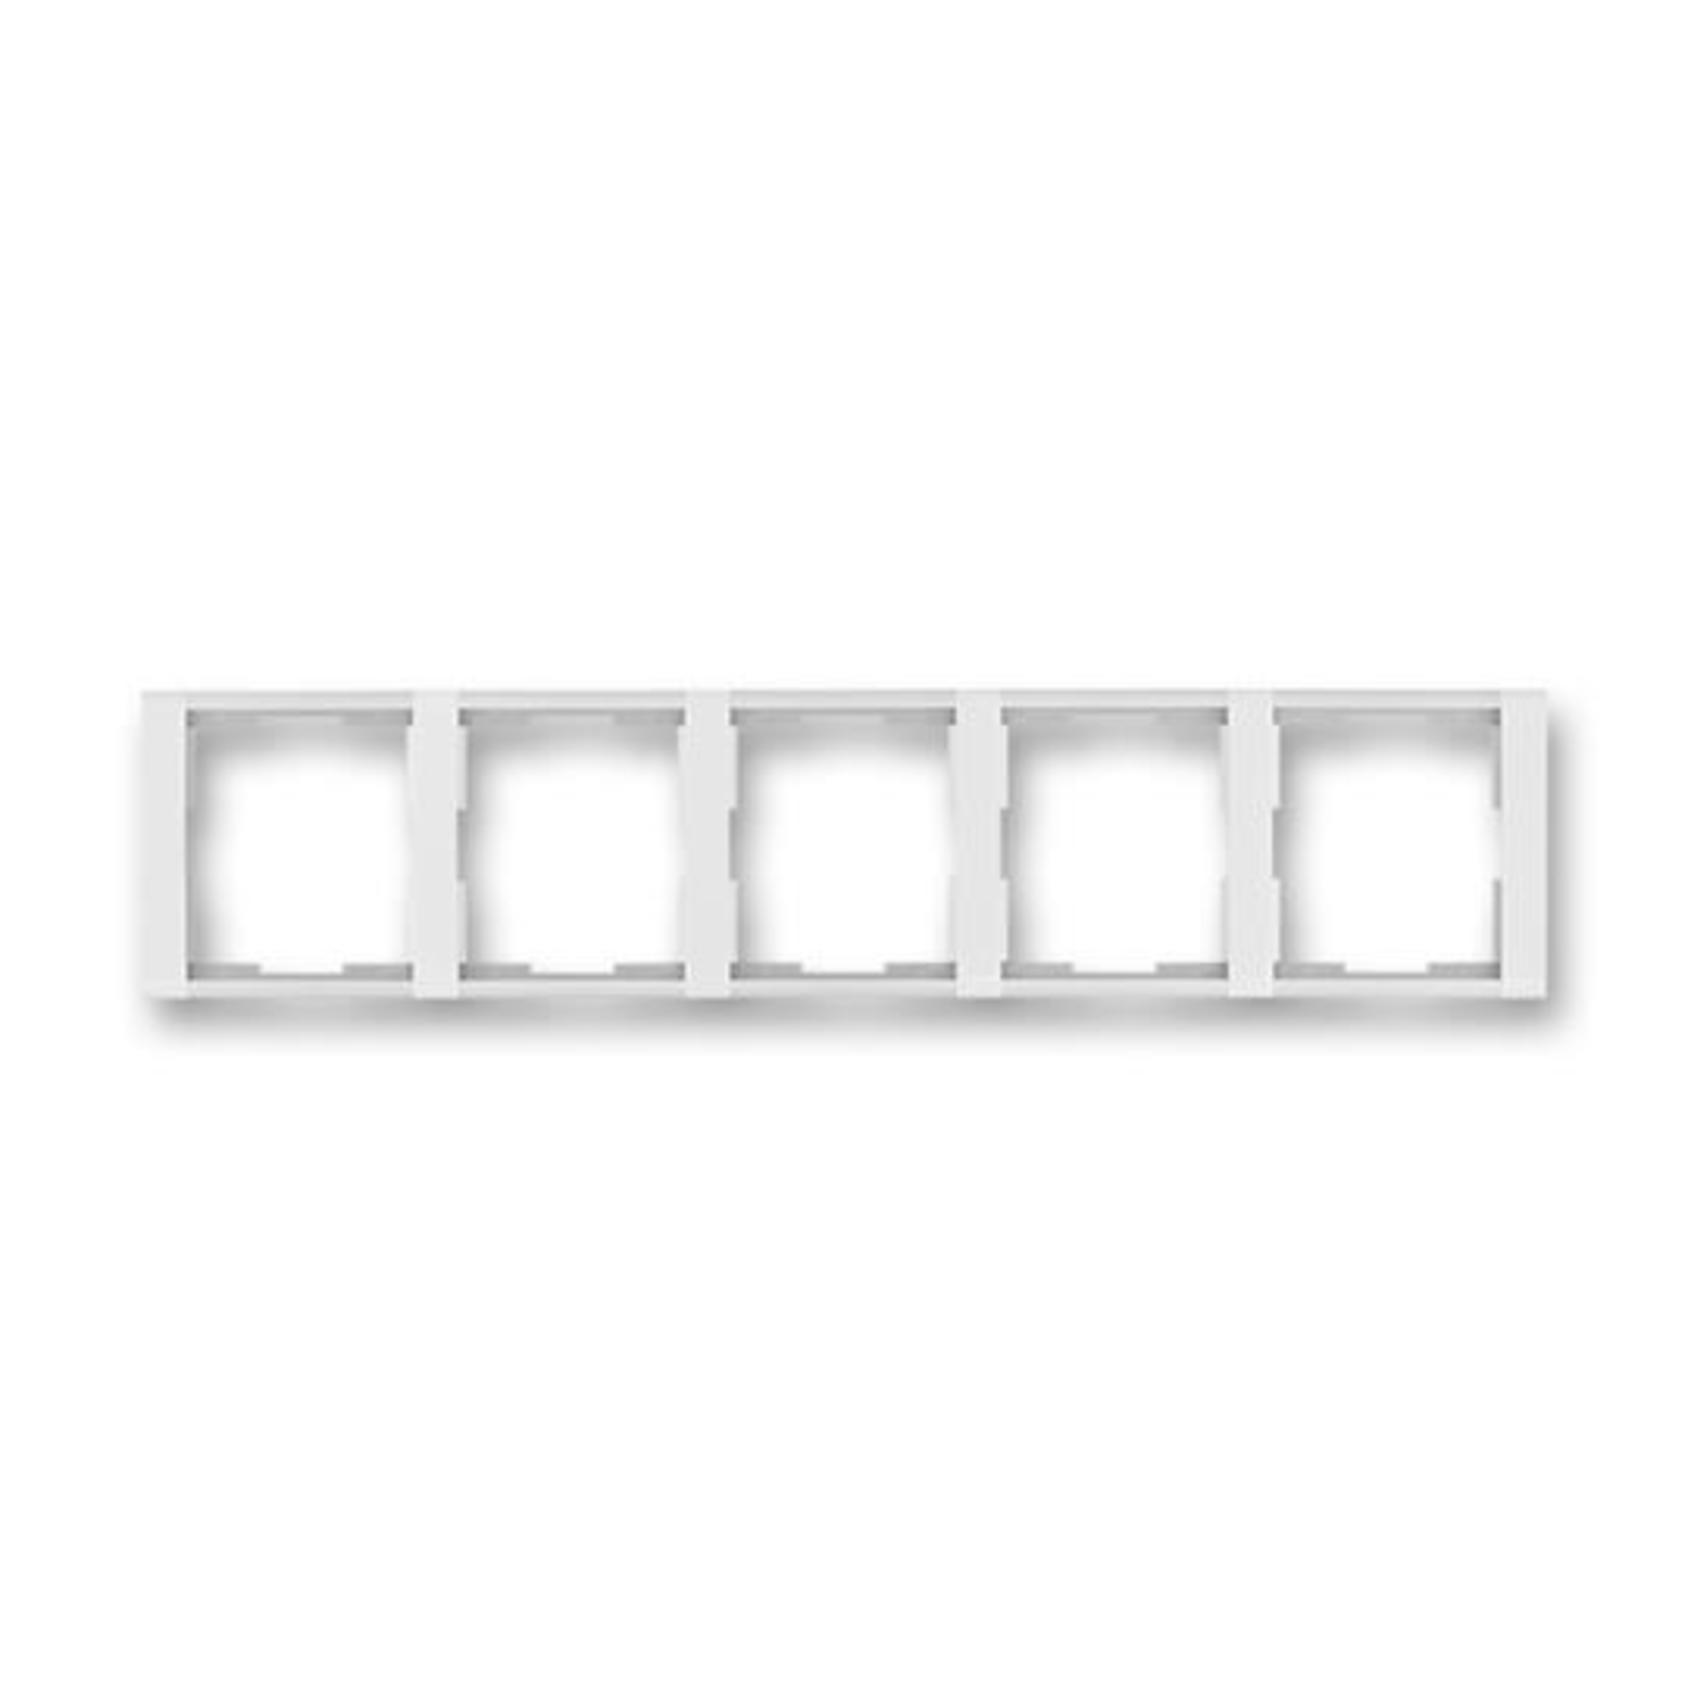 ABB 3901F-A00150 01 Time Rámeček pětinásobný, vodorovný